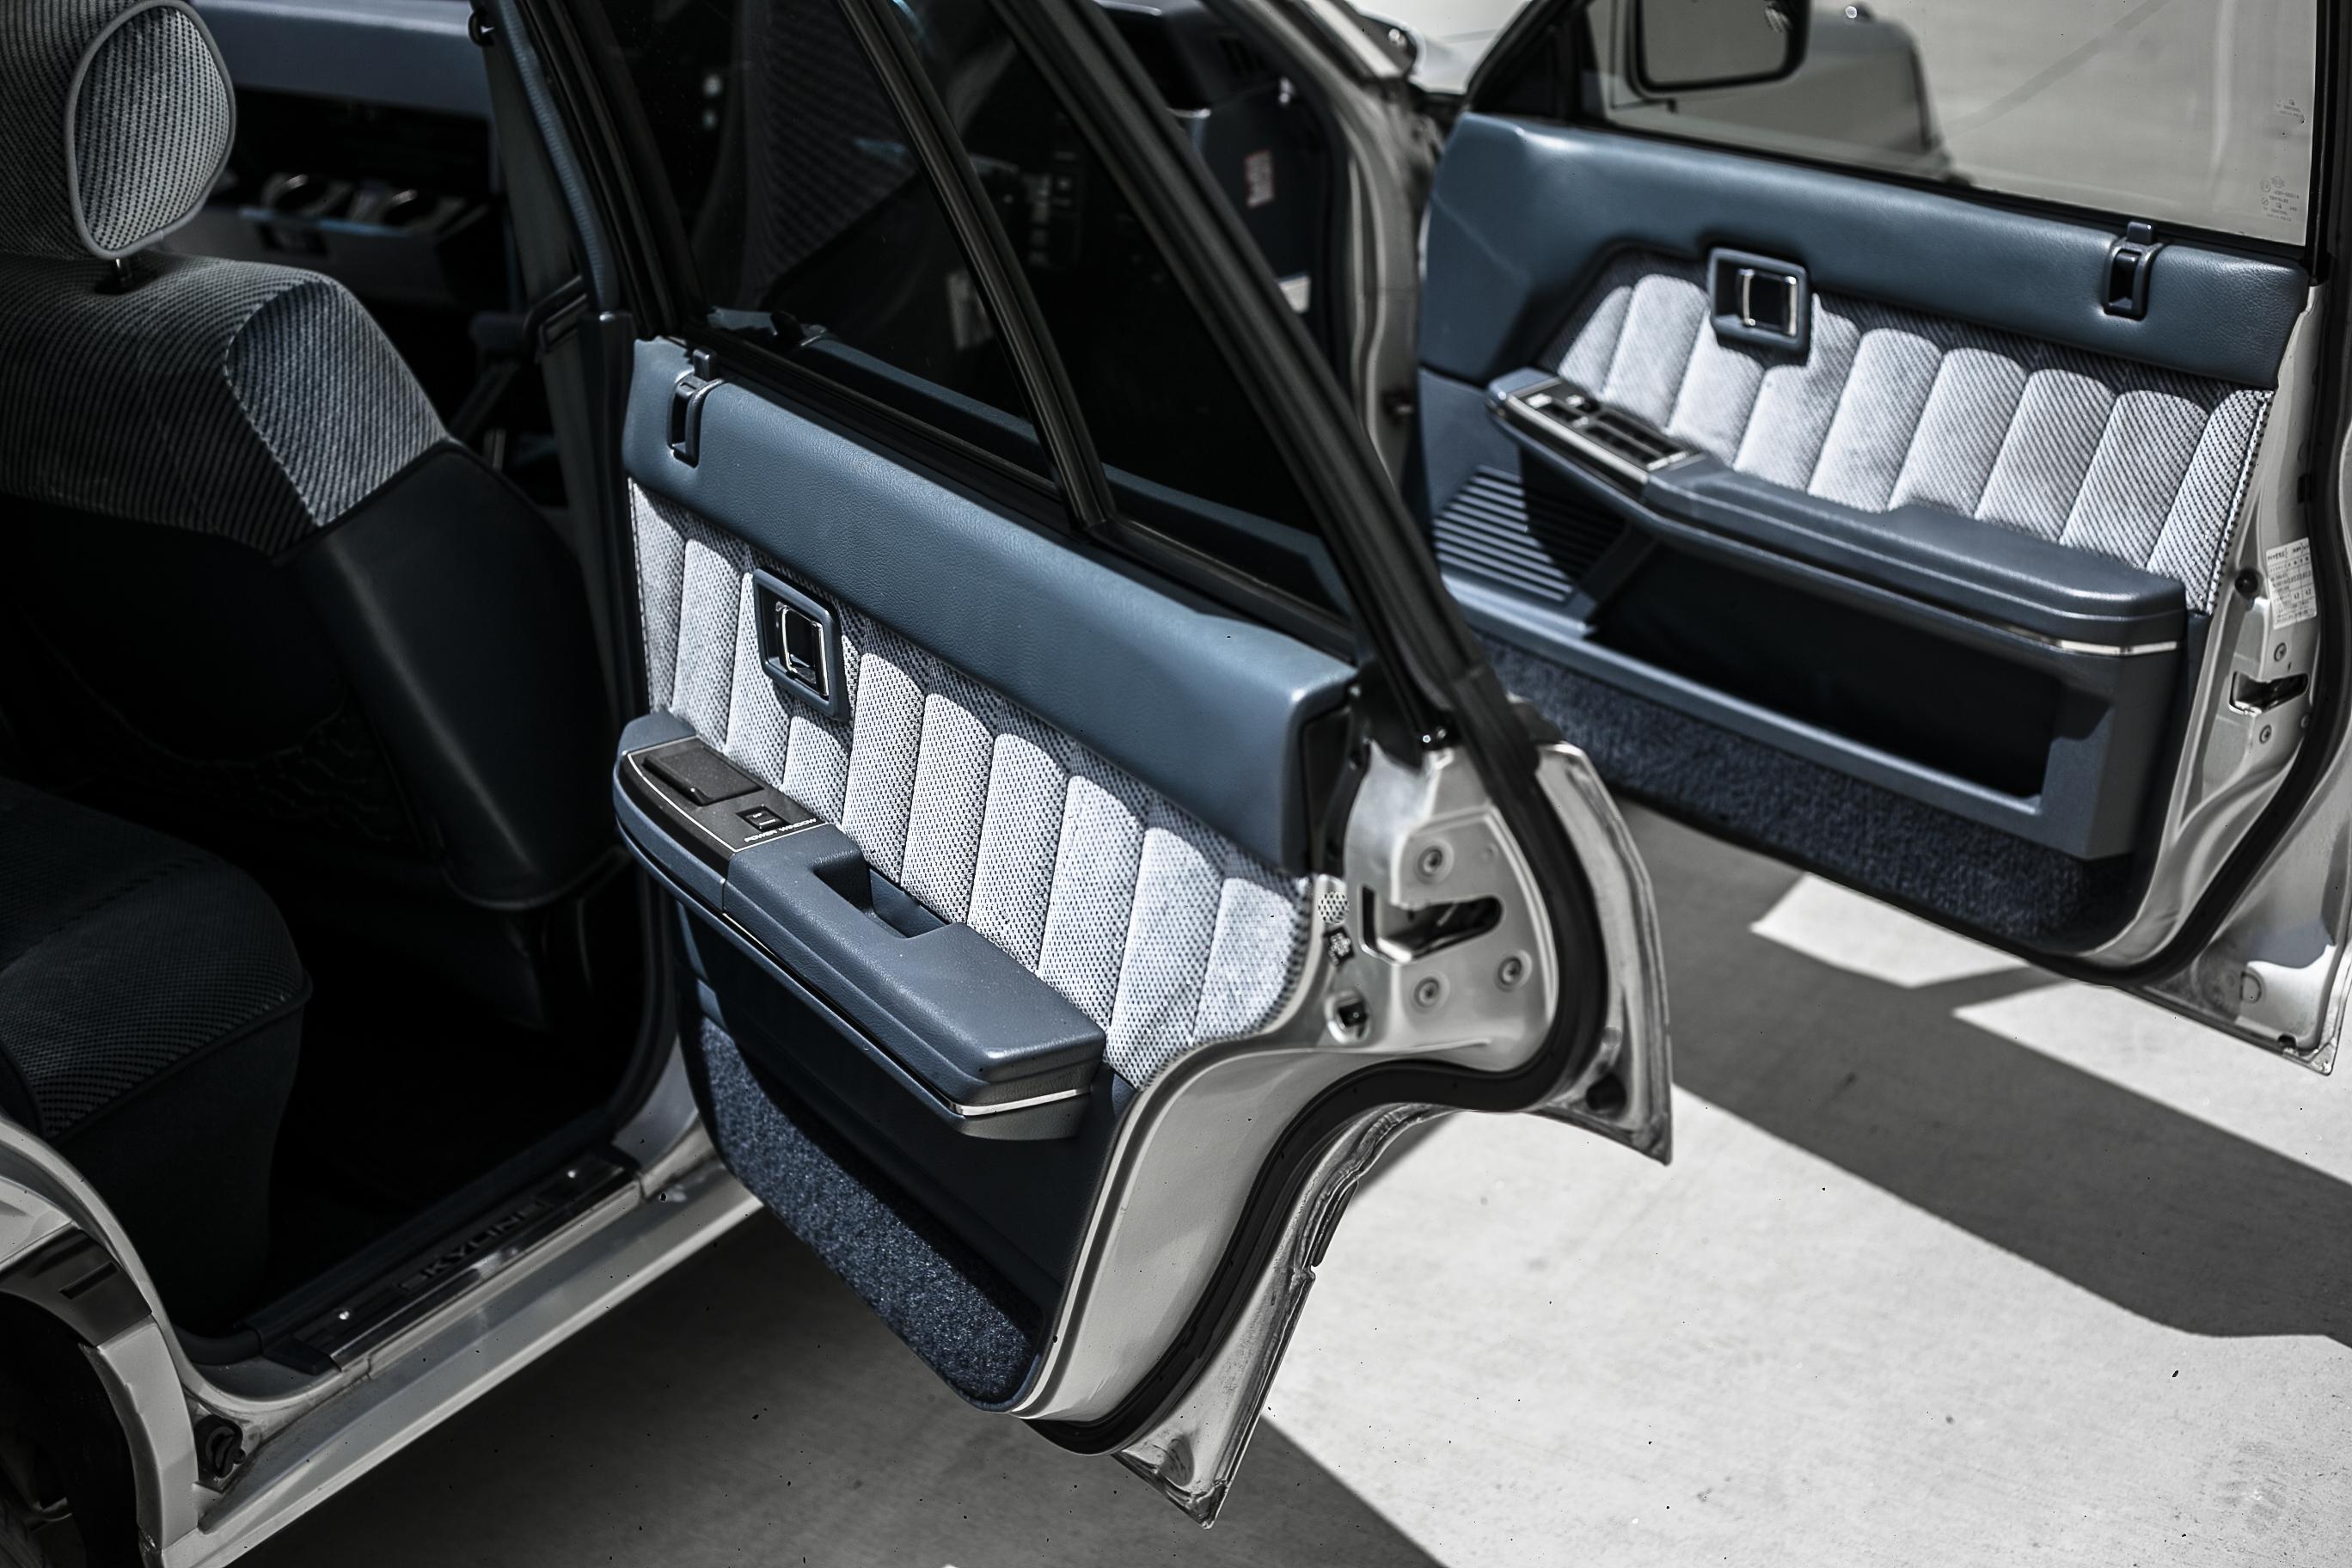 Nissan R31 Skyline turbo wagon door detail